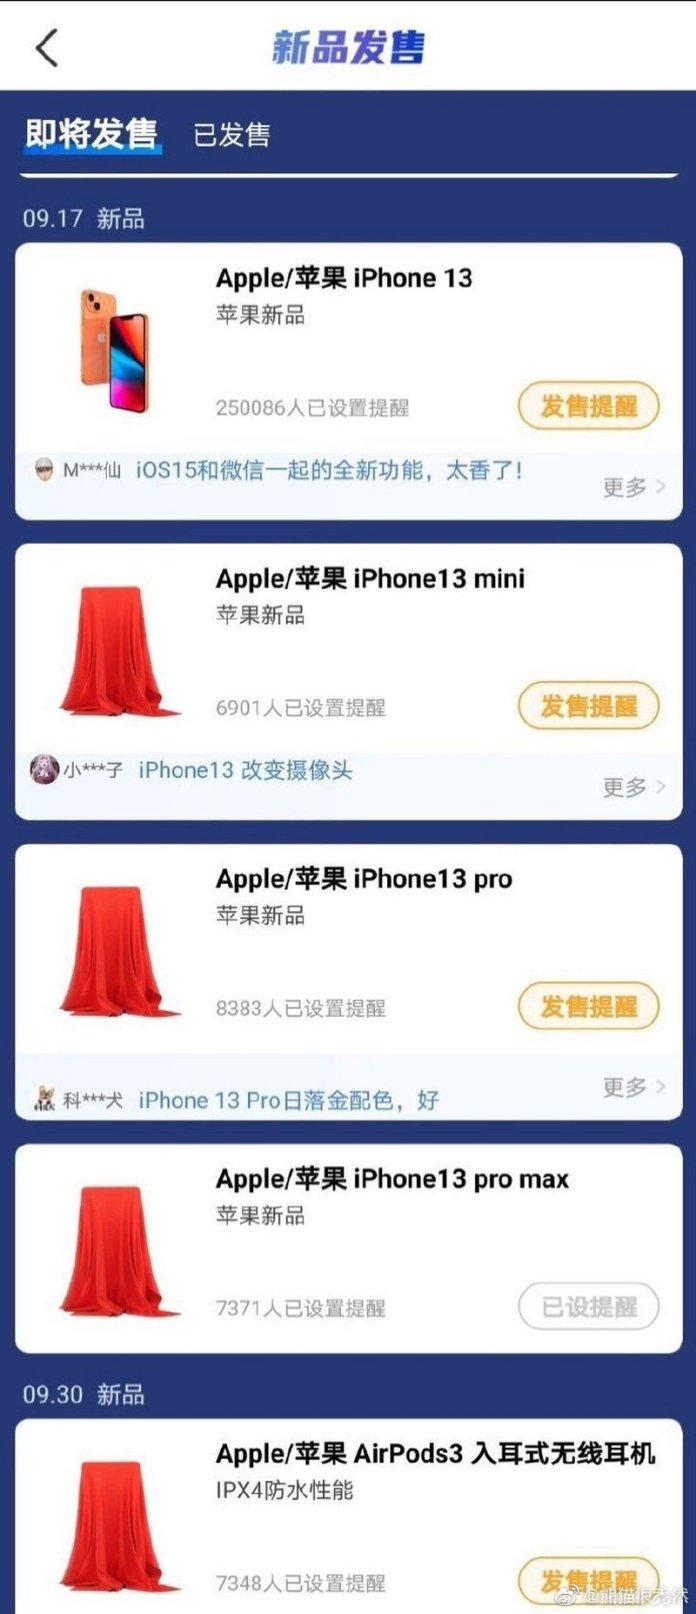 IPhone 13: Ανακοινώνονται 7 Σεπτεμβρίου, κυκλοφορούν στις 17